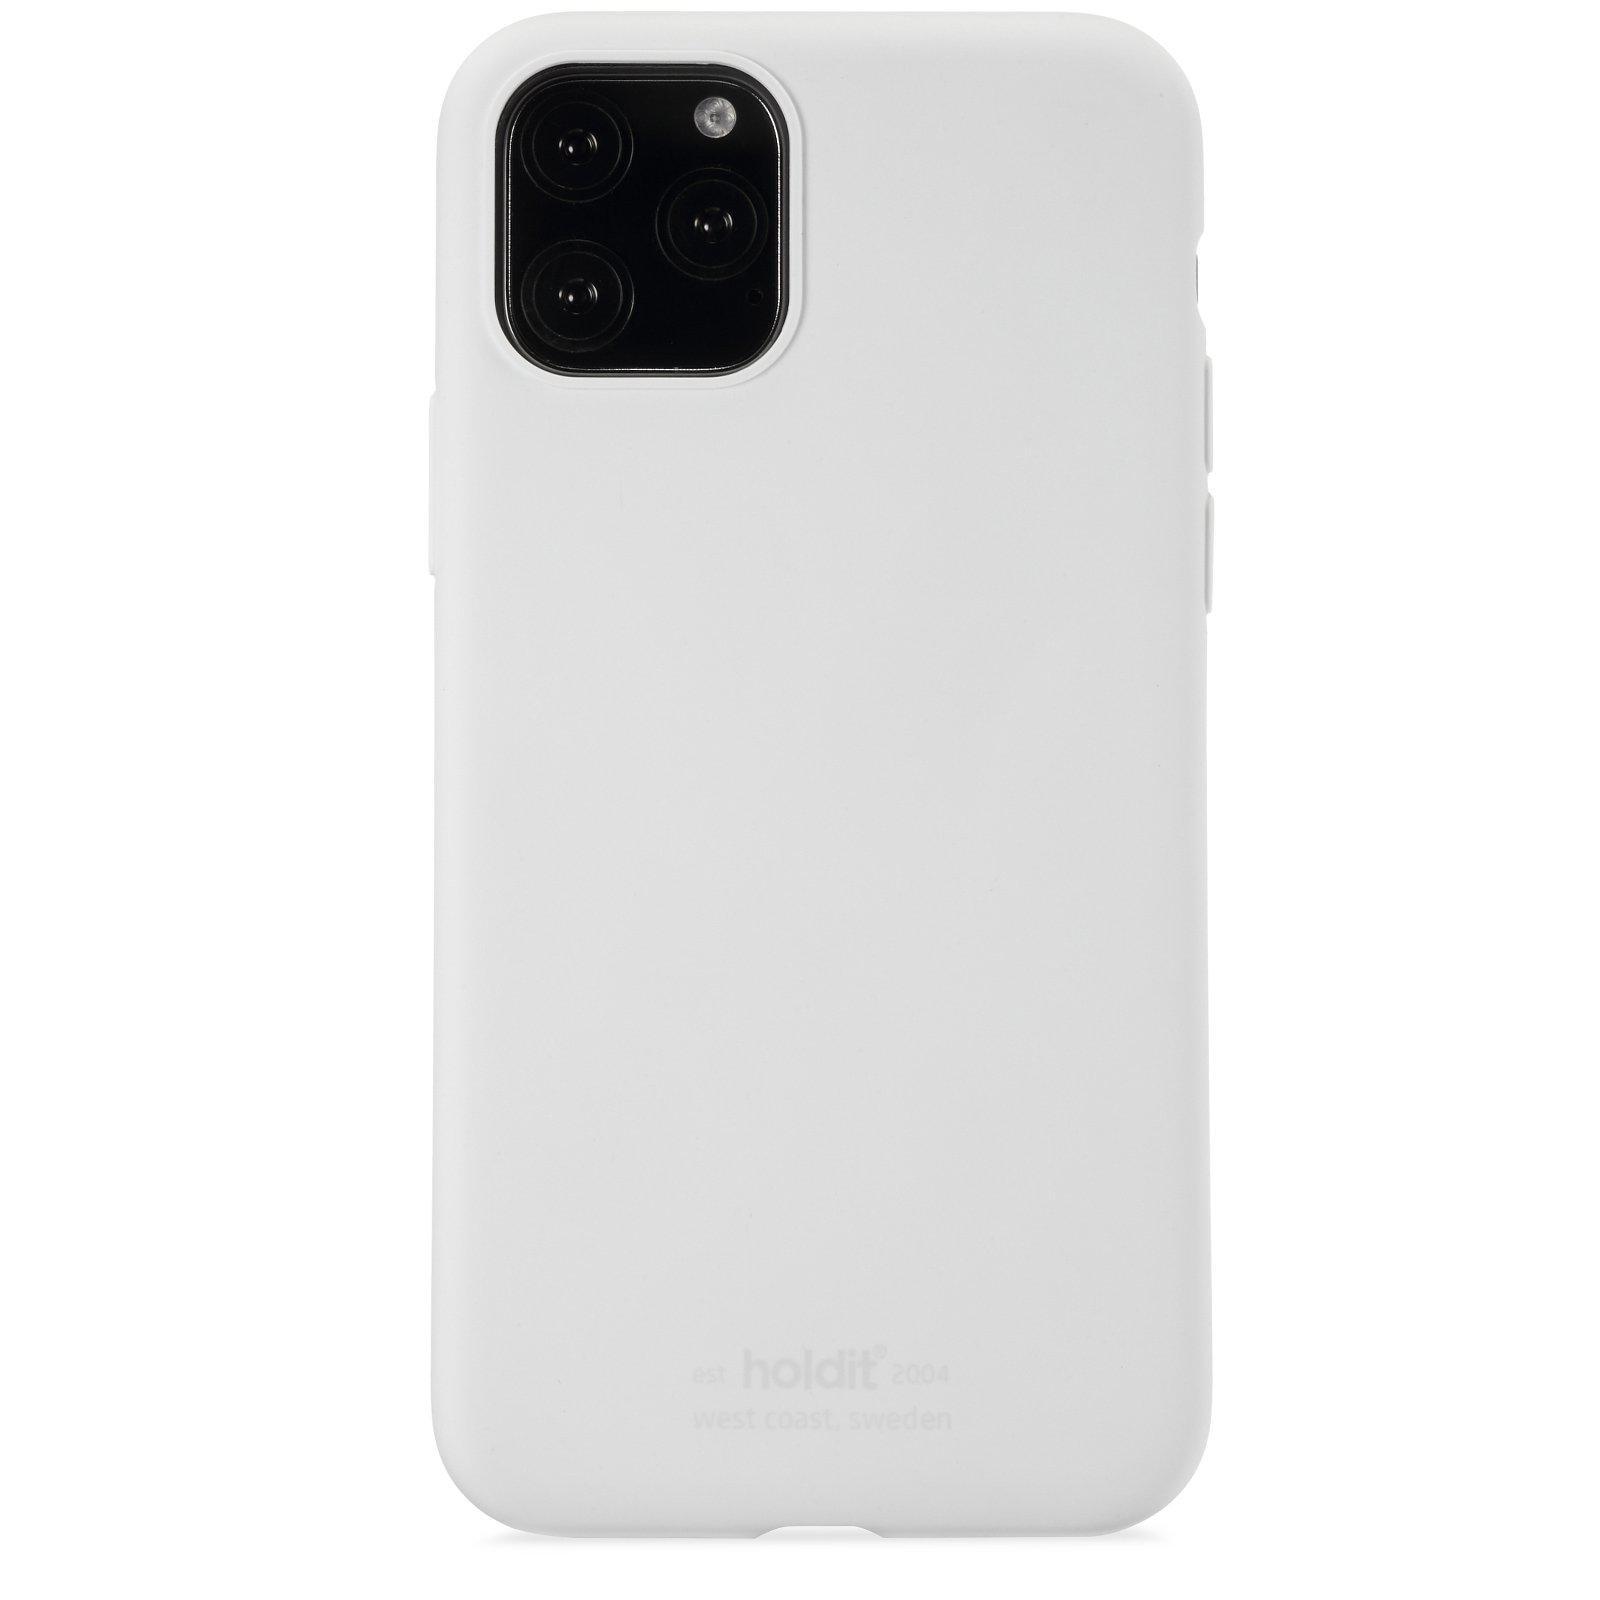 Silikonskal iPhone 11 Pro/XS/X White